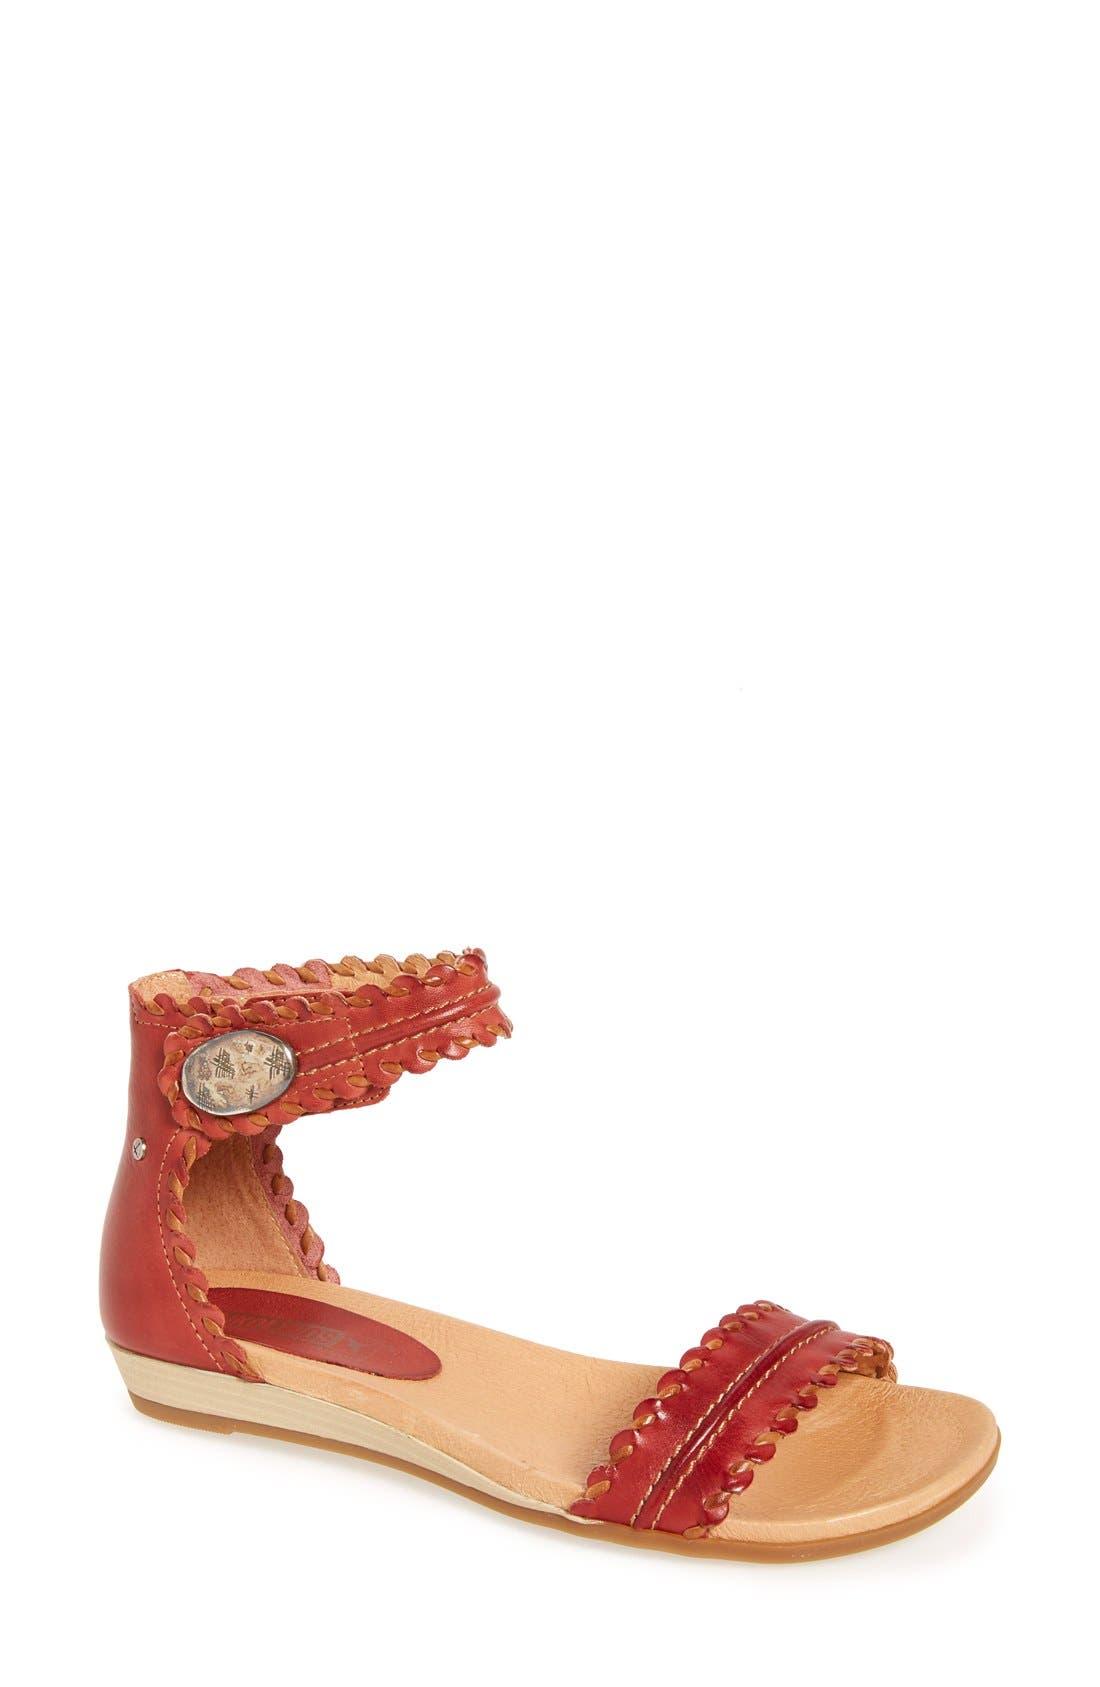 Main Image - PIKOLINOS 'Alcudia' Ankle Strap Sandal (Women)